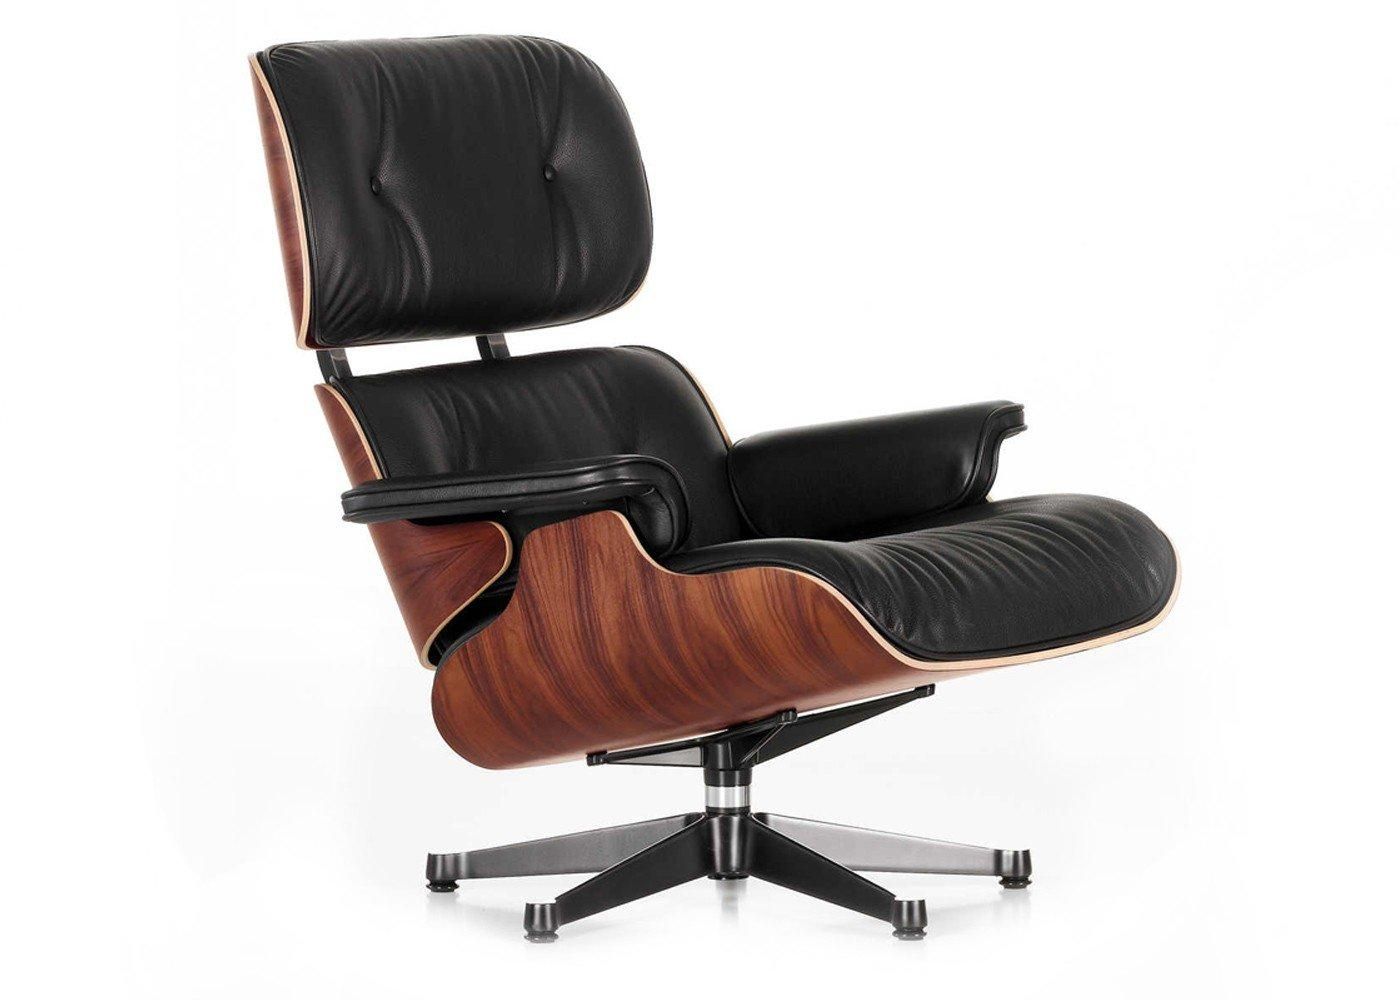 20 photos heel chair sofas sofa ideas for Eames chair england